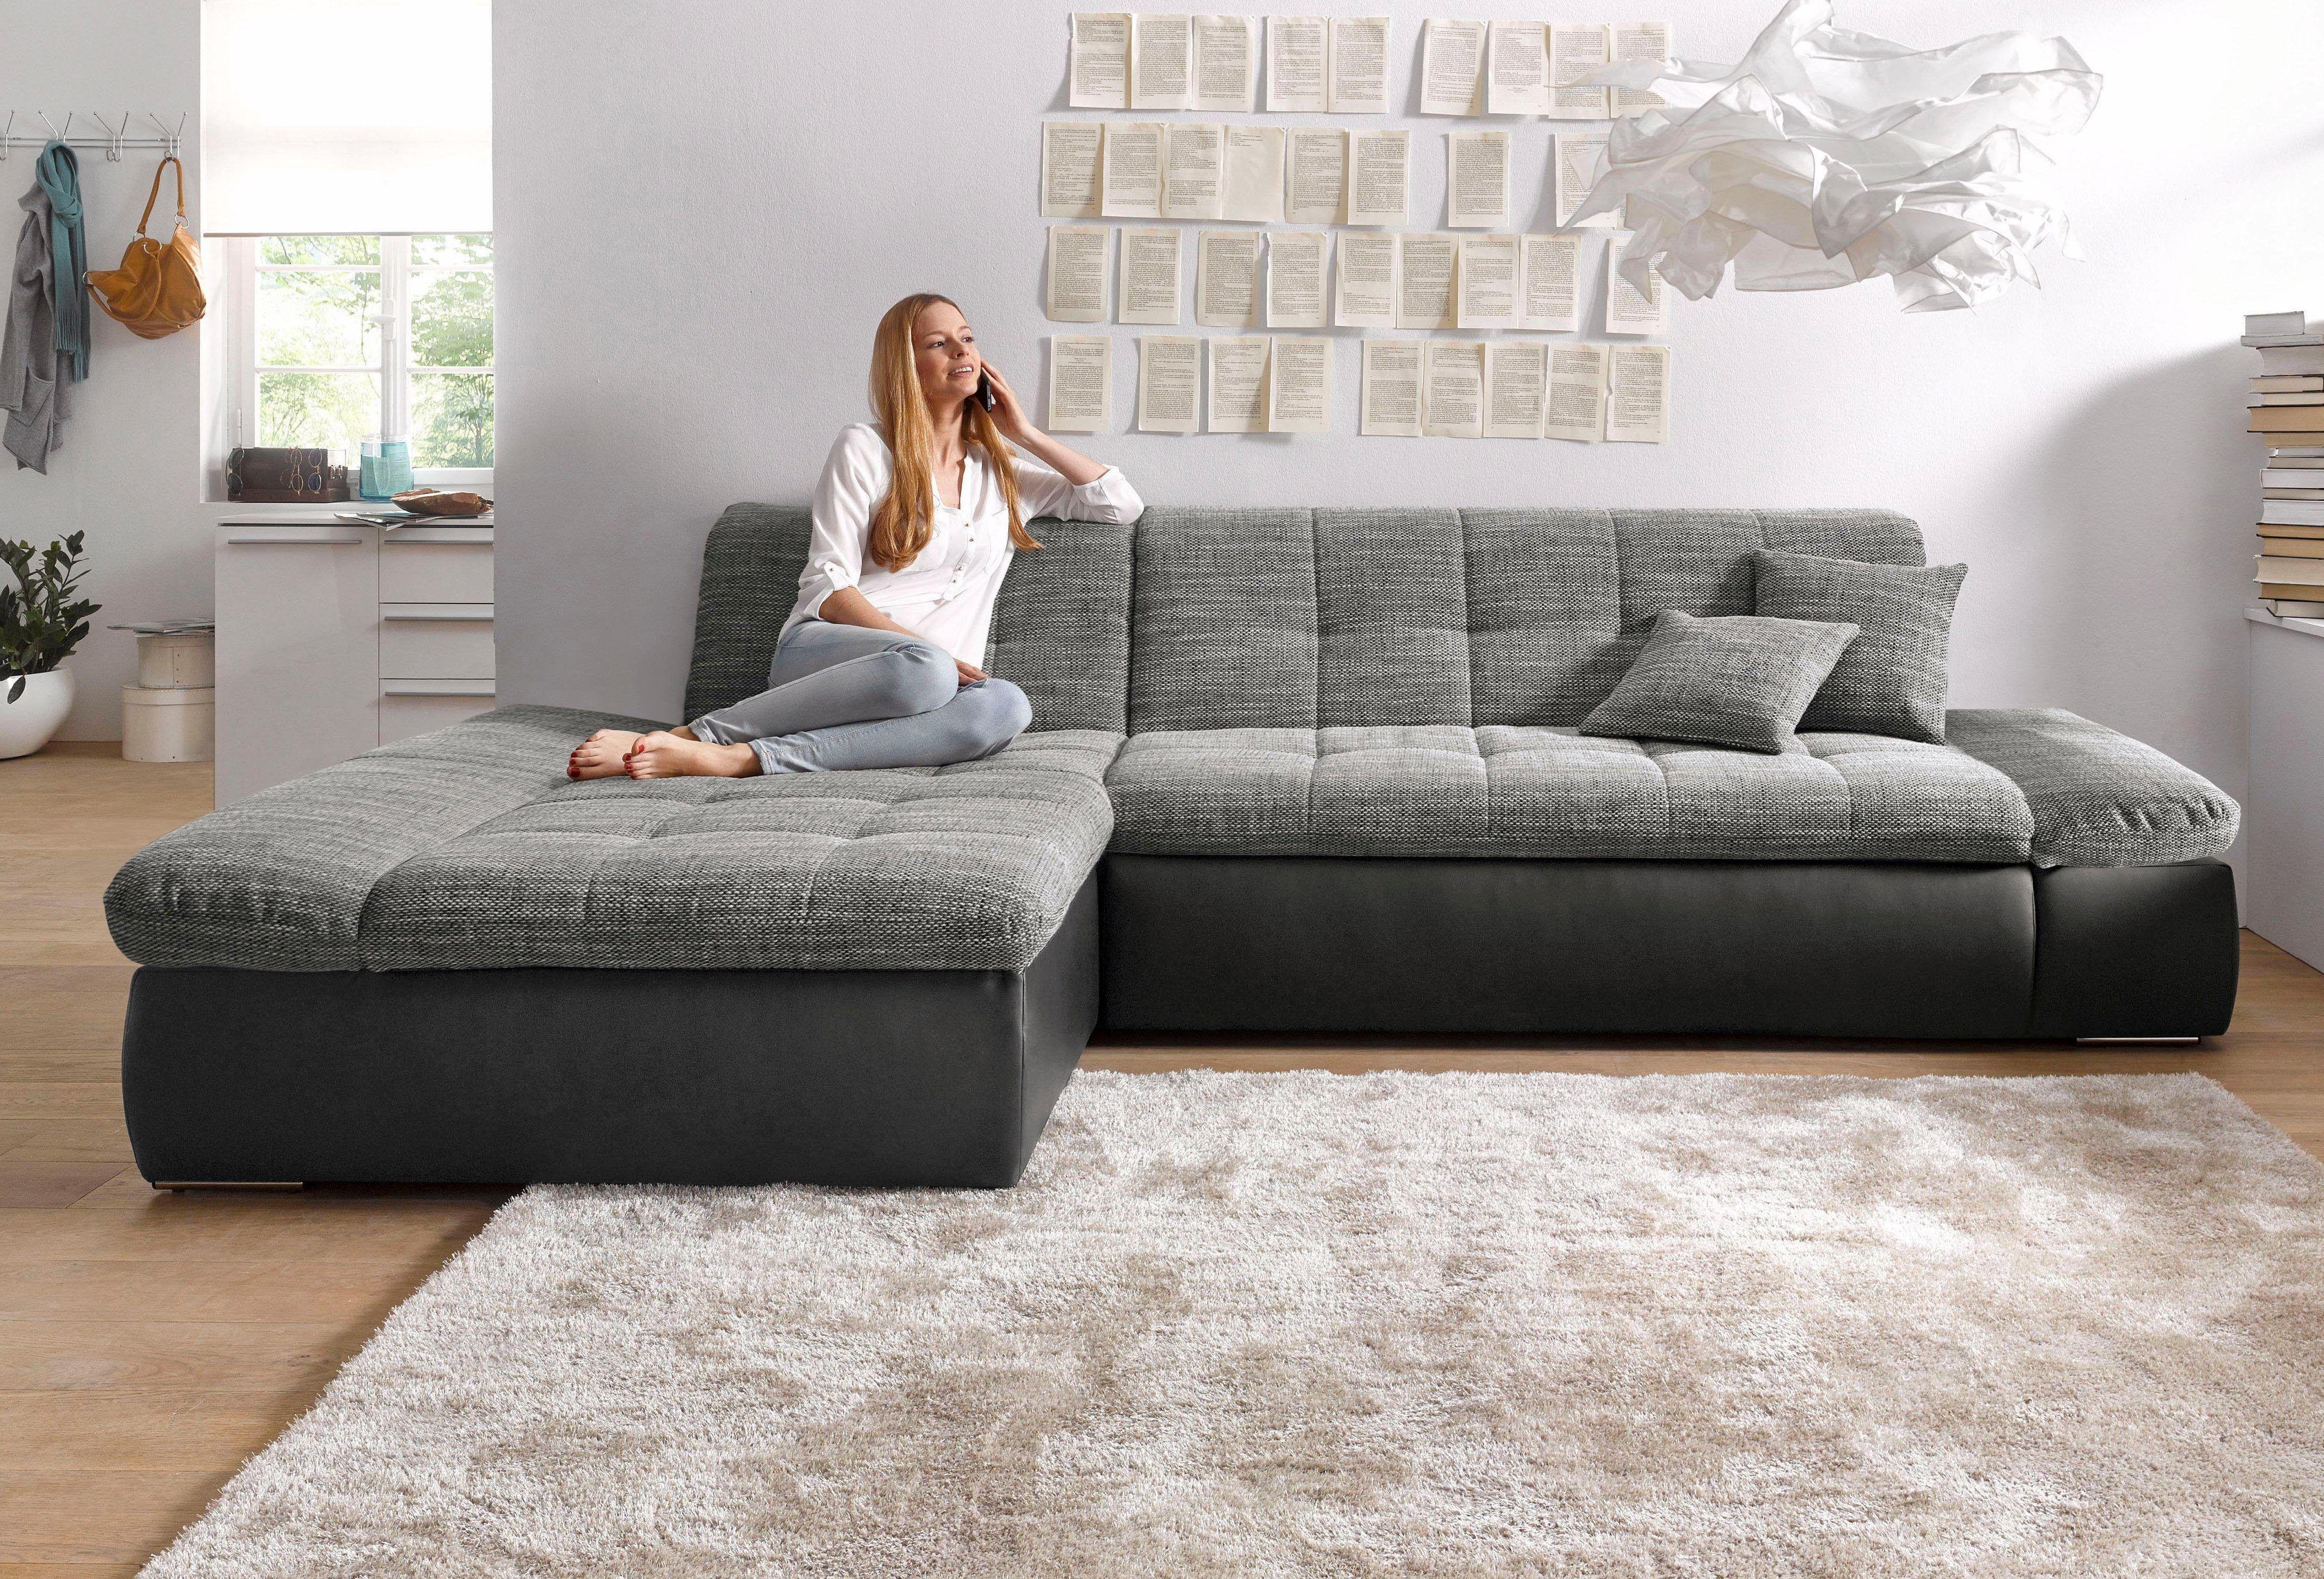 Top Ergebnis 50 Genial Xxxl Big sofa Bilder 2017 Kgit4 2017